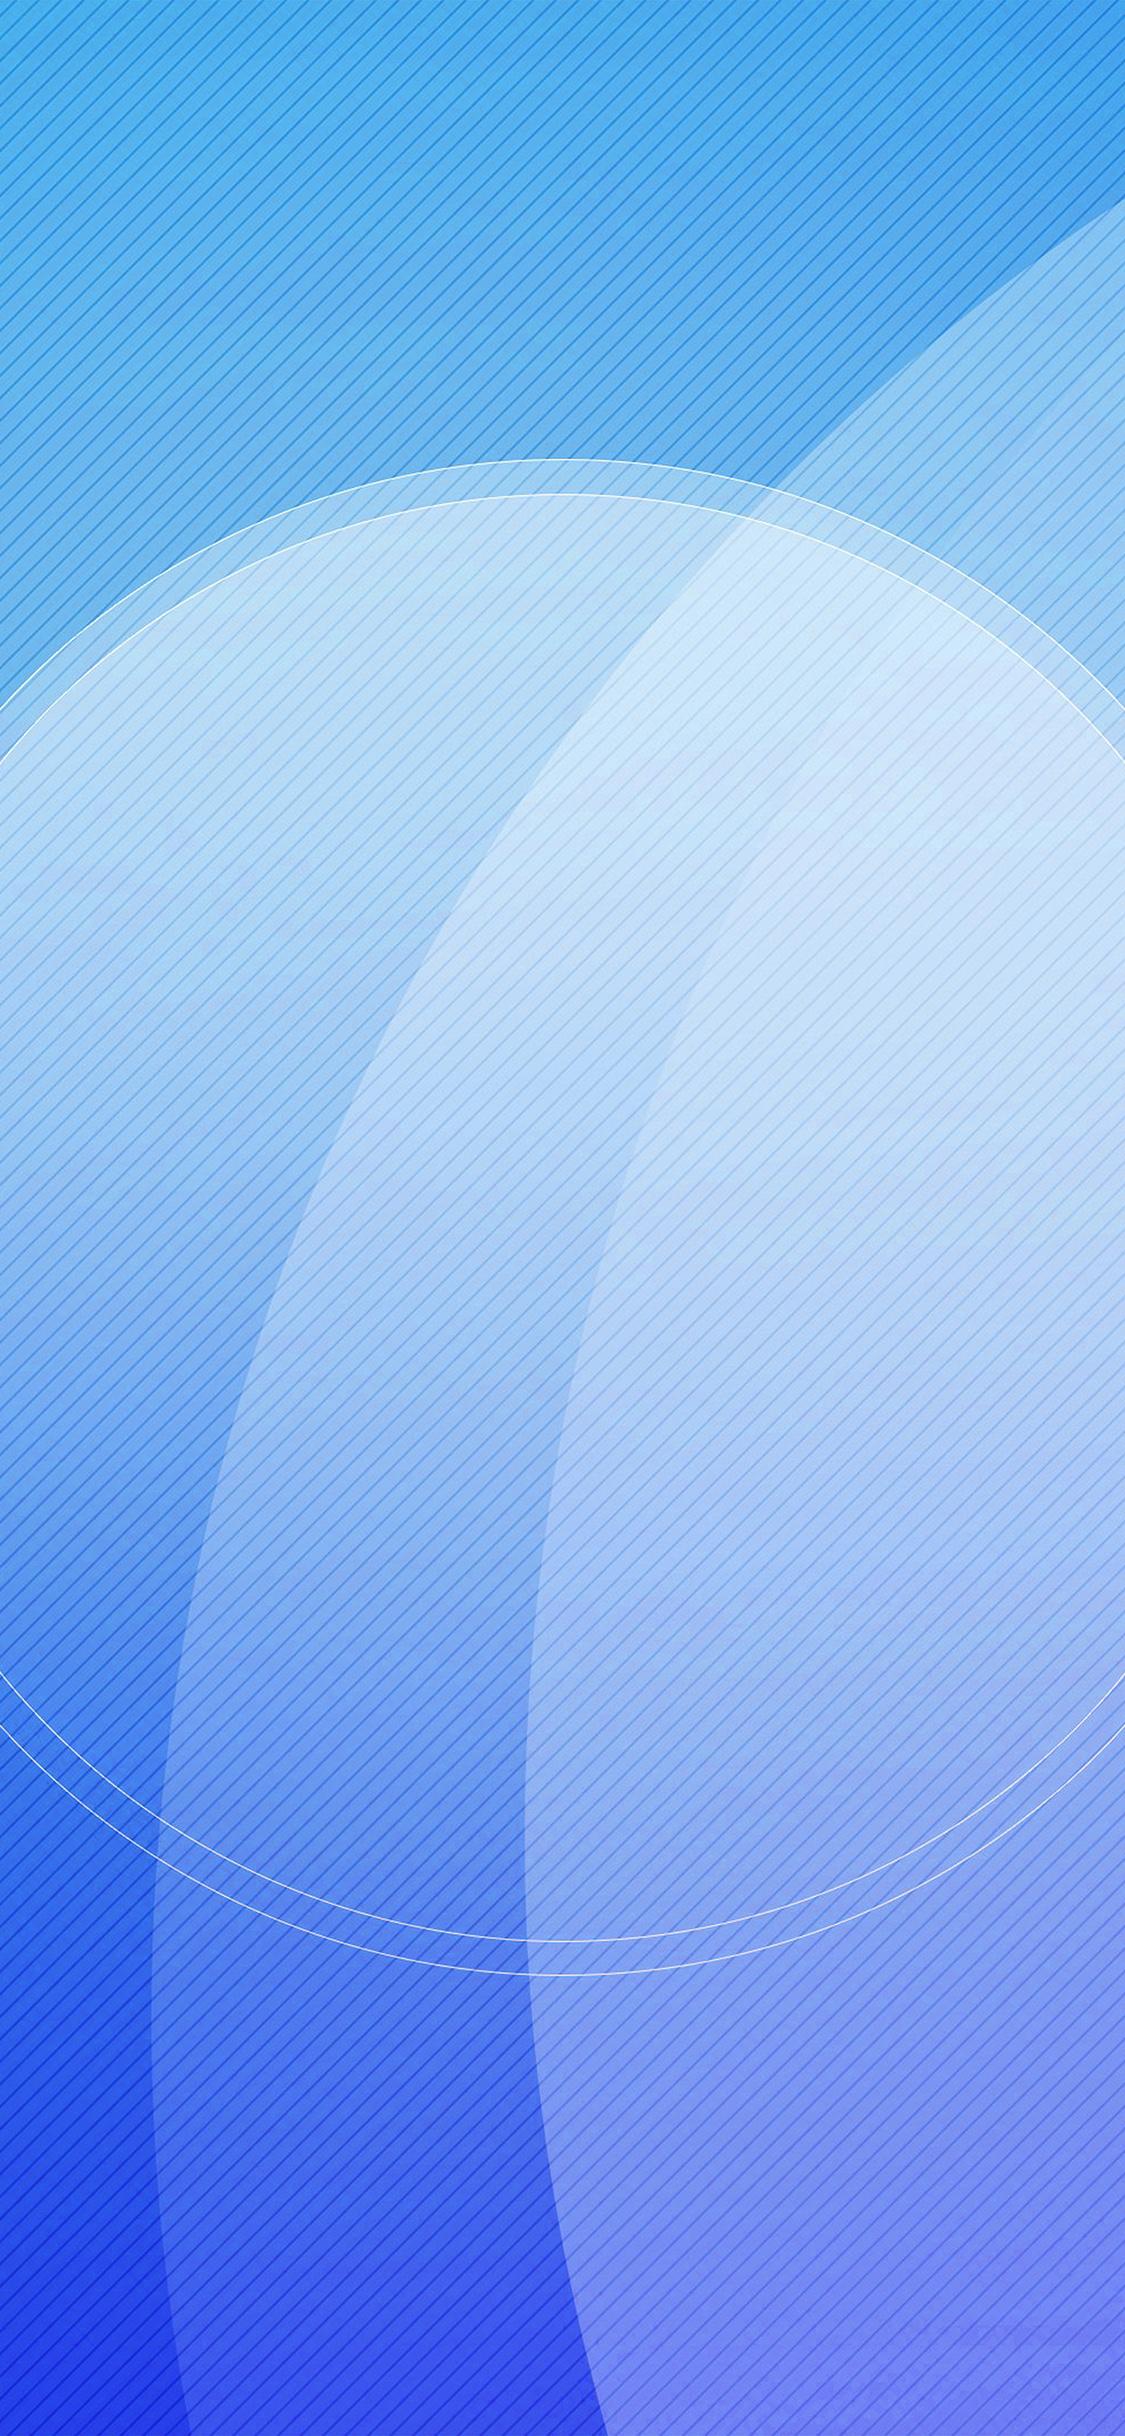 iPhoneXpapers.com-Apple-iPhone-wallpaper-vp51-blue-purple-digital-art-circle-pattern